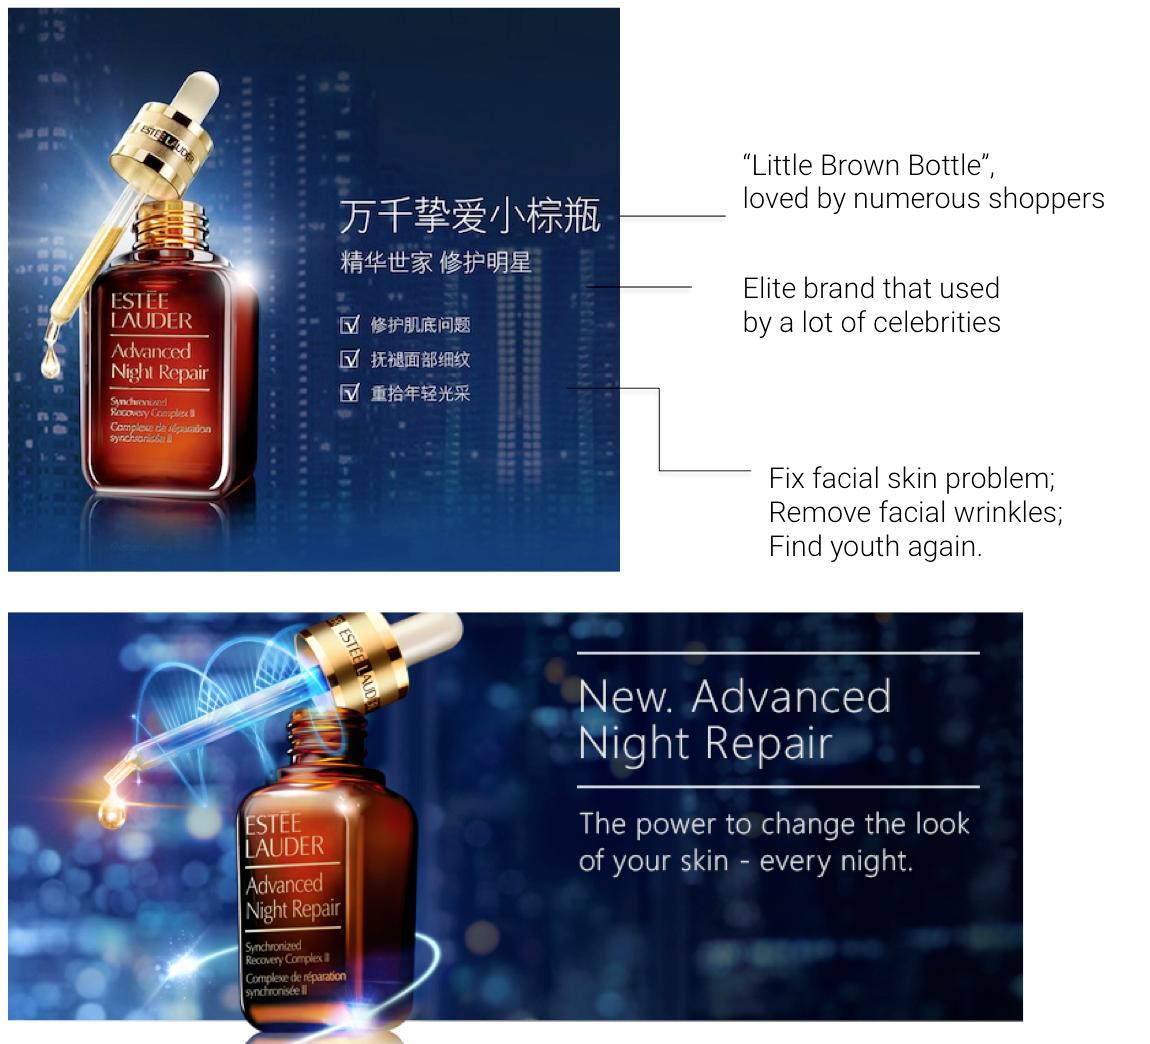 Estee Lauder little brown bottle China eCommerce localization TMO Group